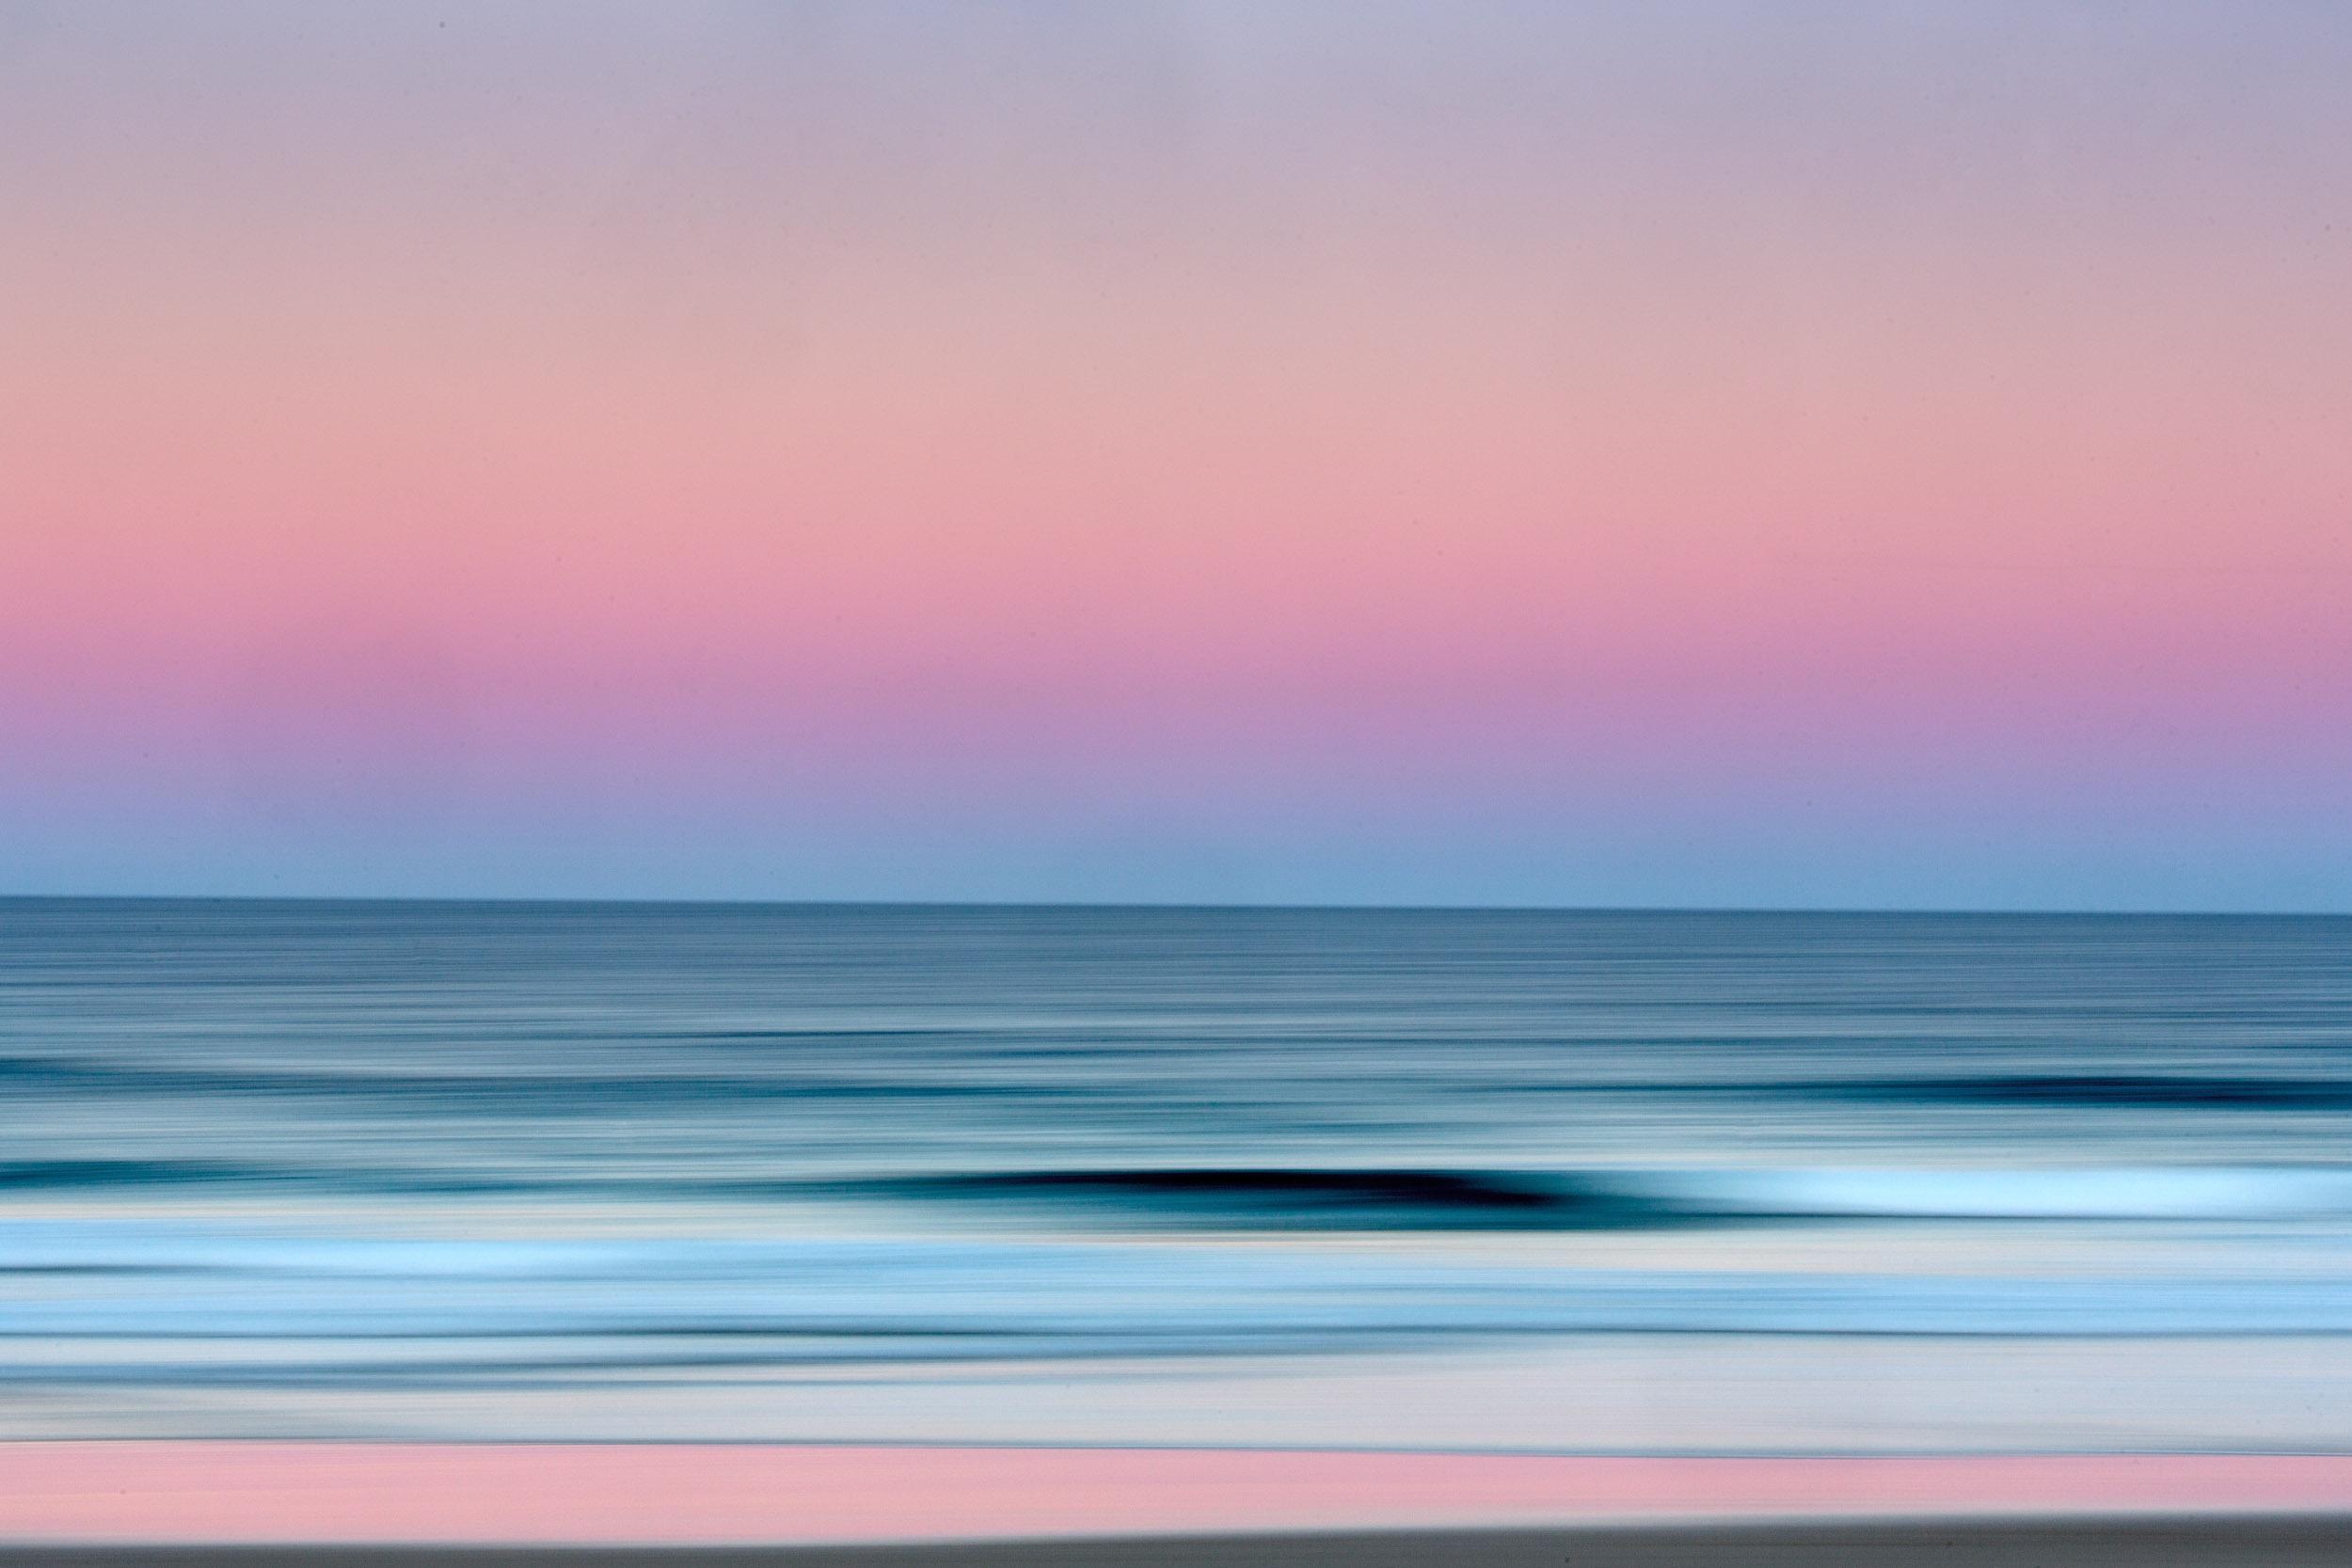 sunshine-coast-beaches-on-dusk.jpg